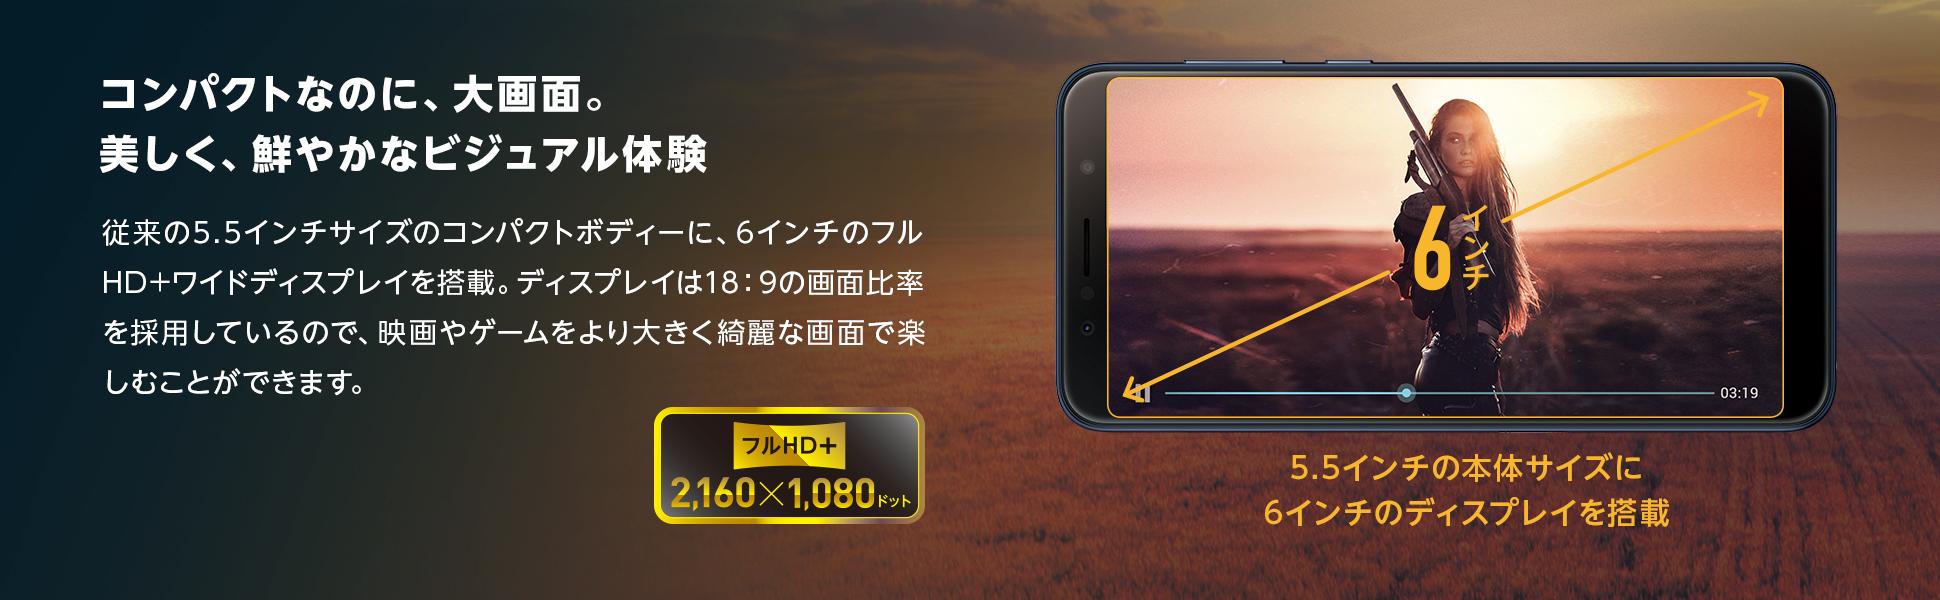 ZenFone Max Pro ZB602KL